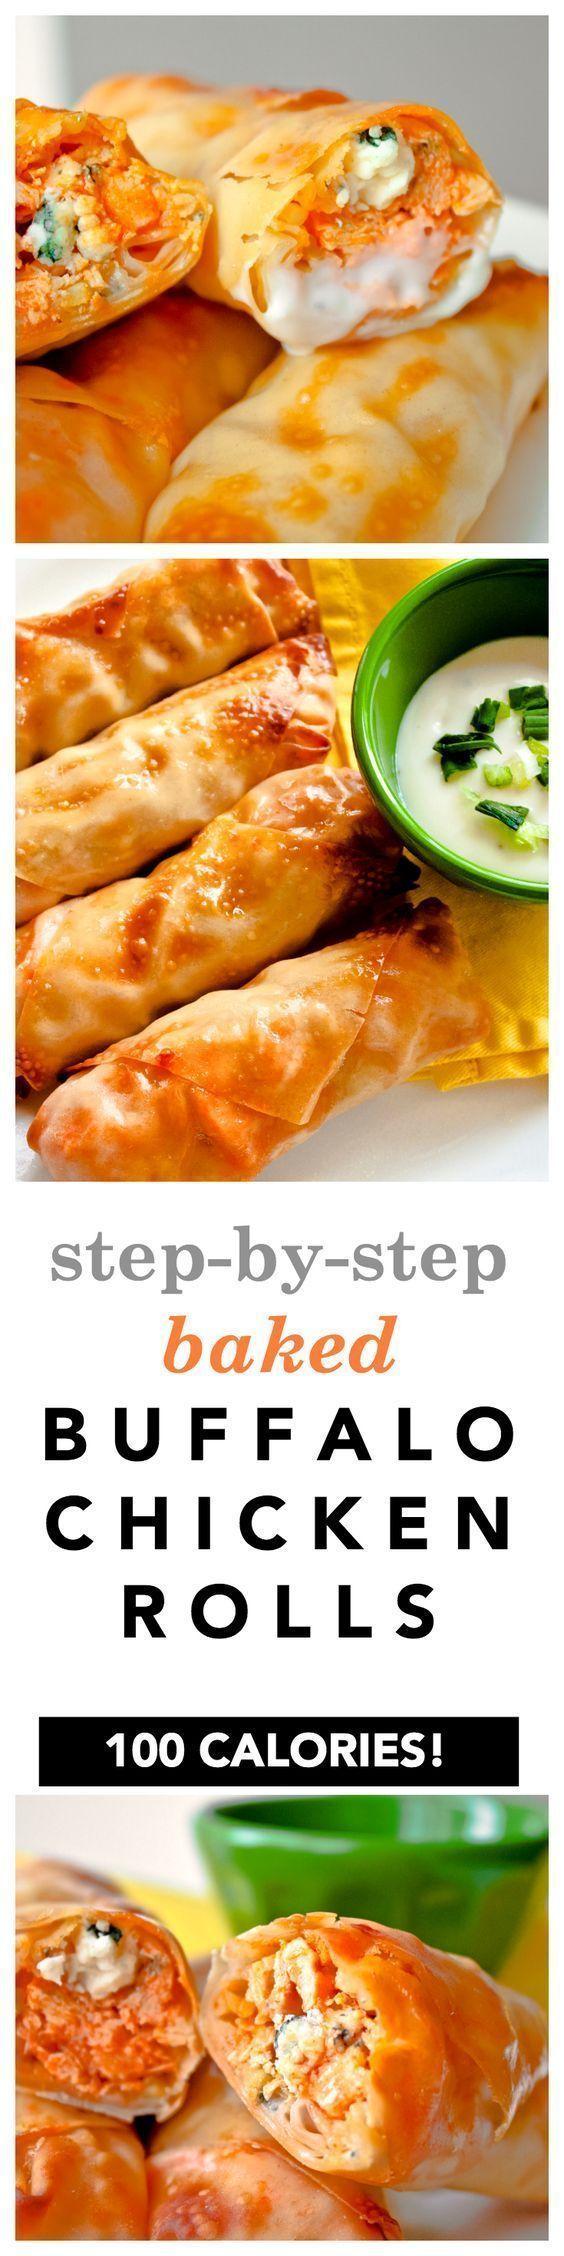 Healthy Thai Recipes http://healthythairecipes.com/starbucks-copy-cat-thai-chicken-snack-wraps/